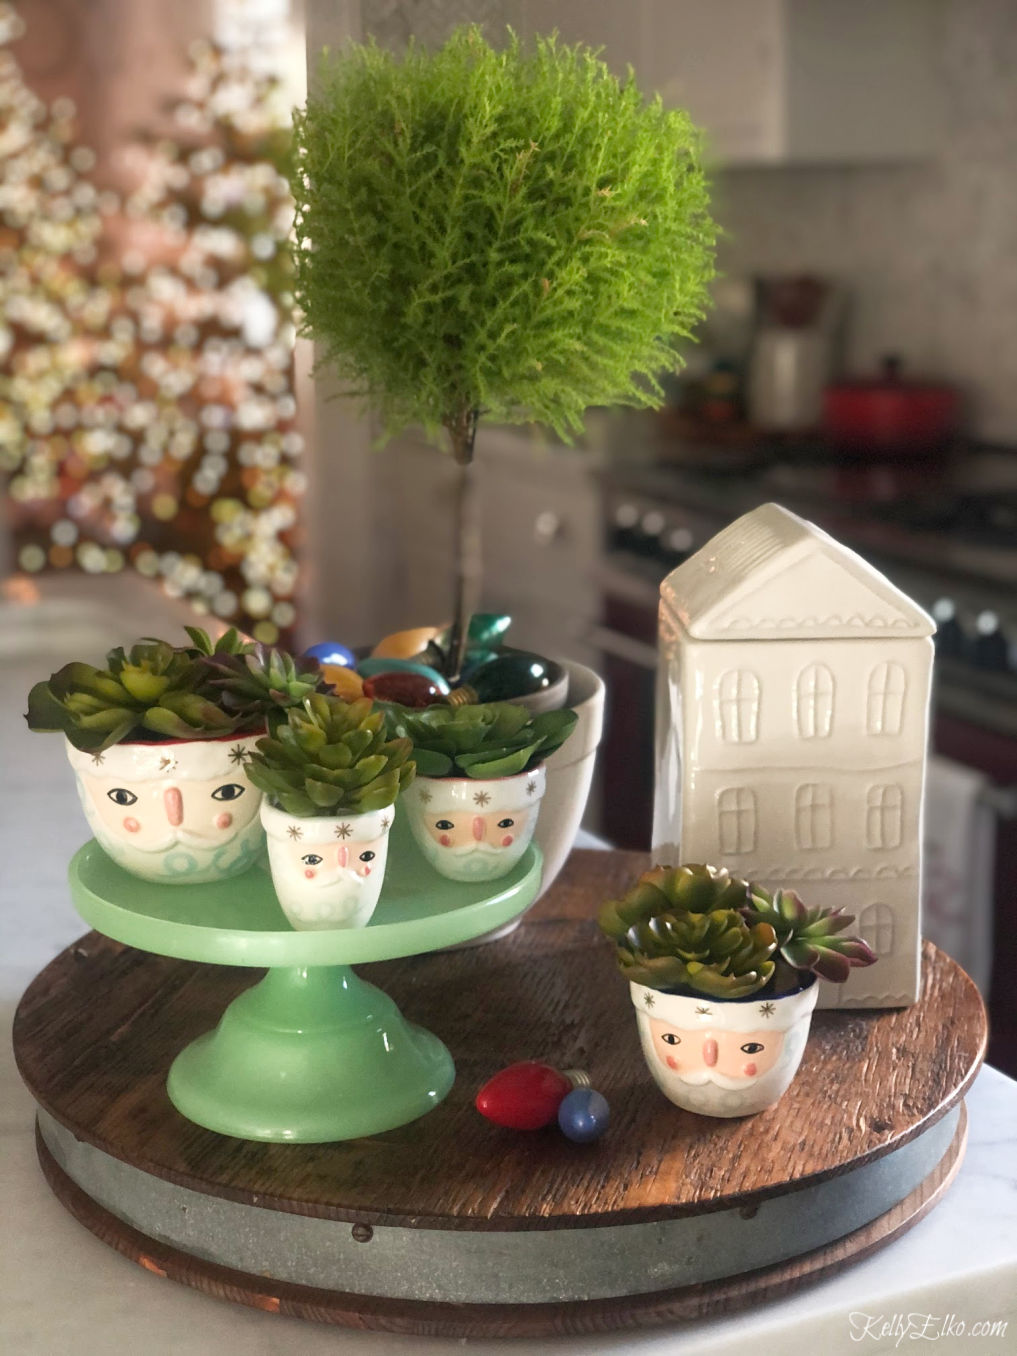 Love these adorable Santa measuring cups kellyelko.com #christmasdecor #santa #christmaskitchen #cookiejar #christmasdecorations #kellyelko